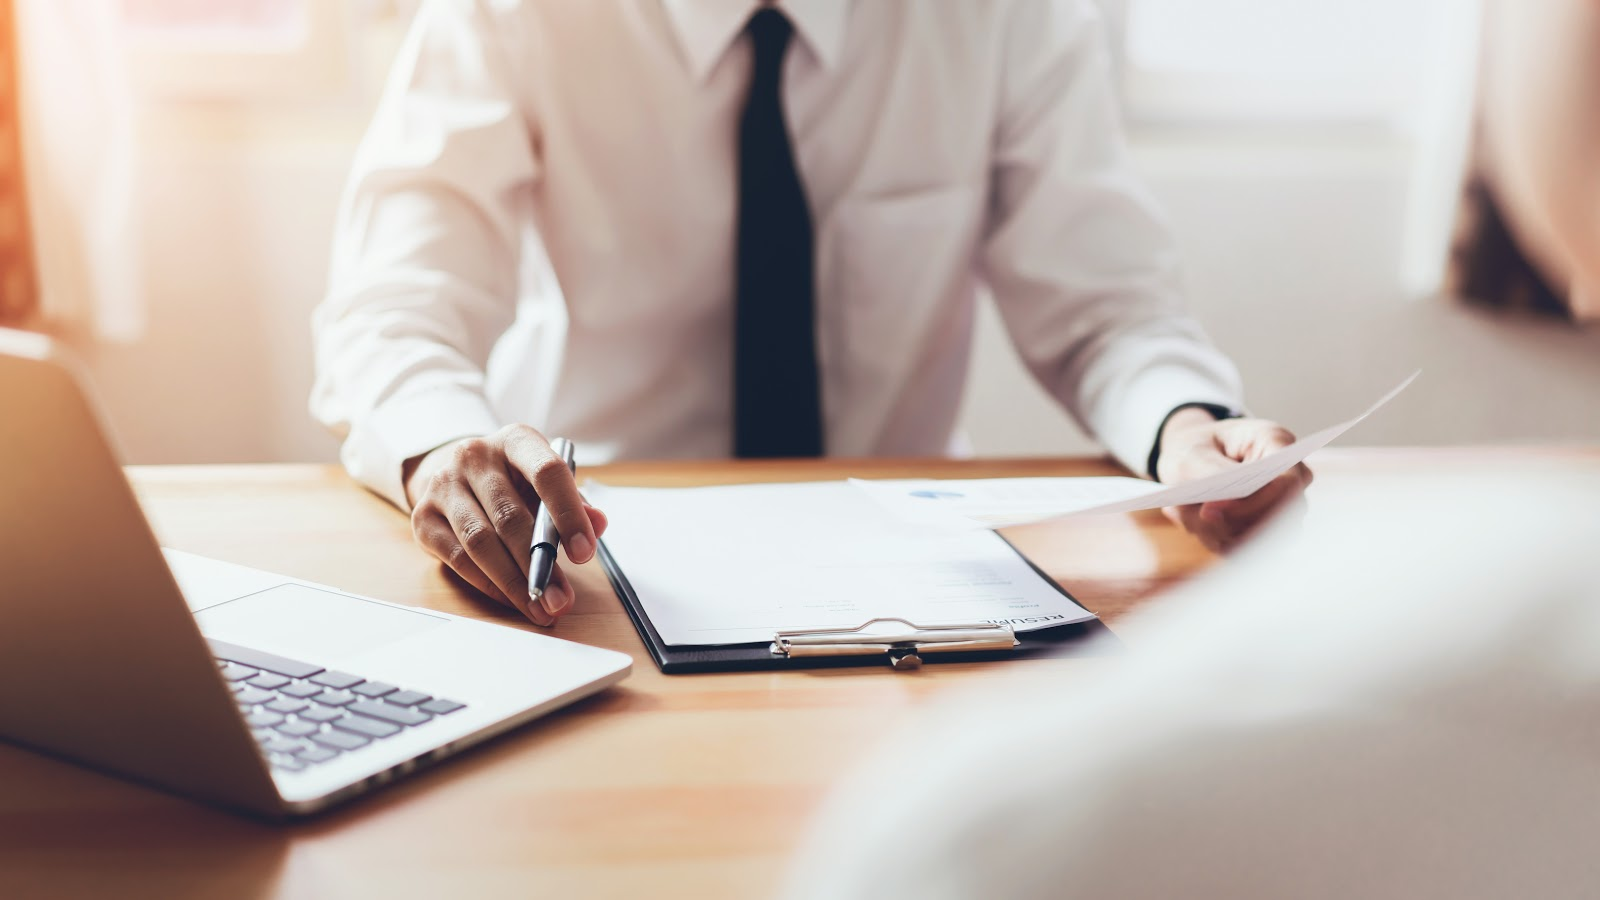 internship resume: Interviewer reviewing a resume